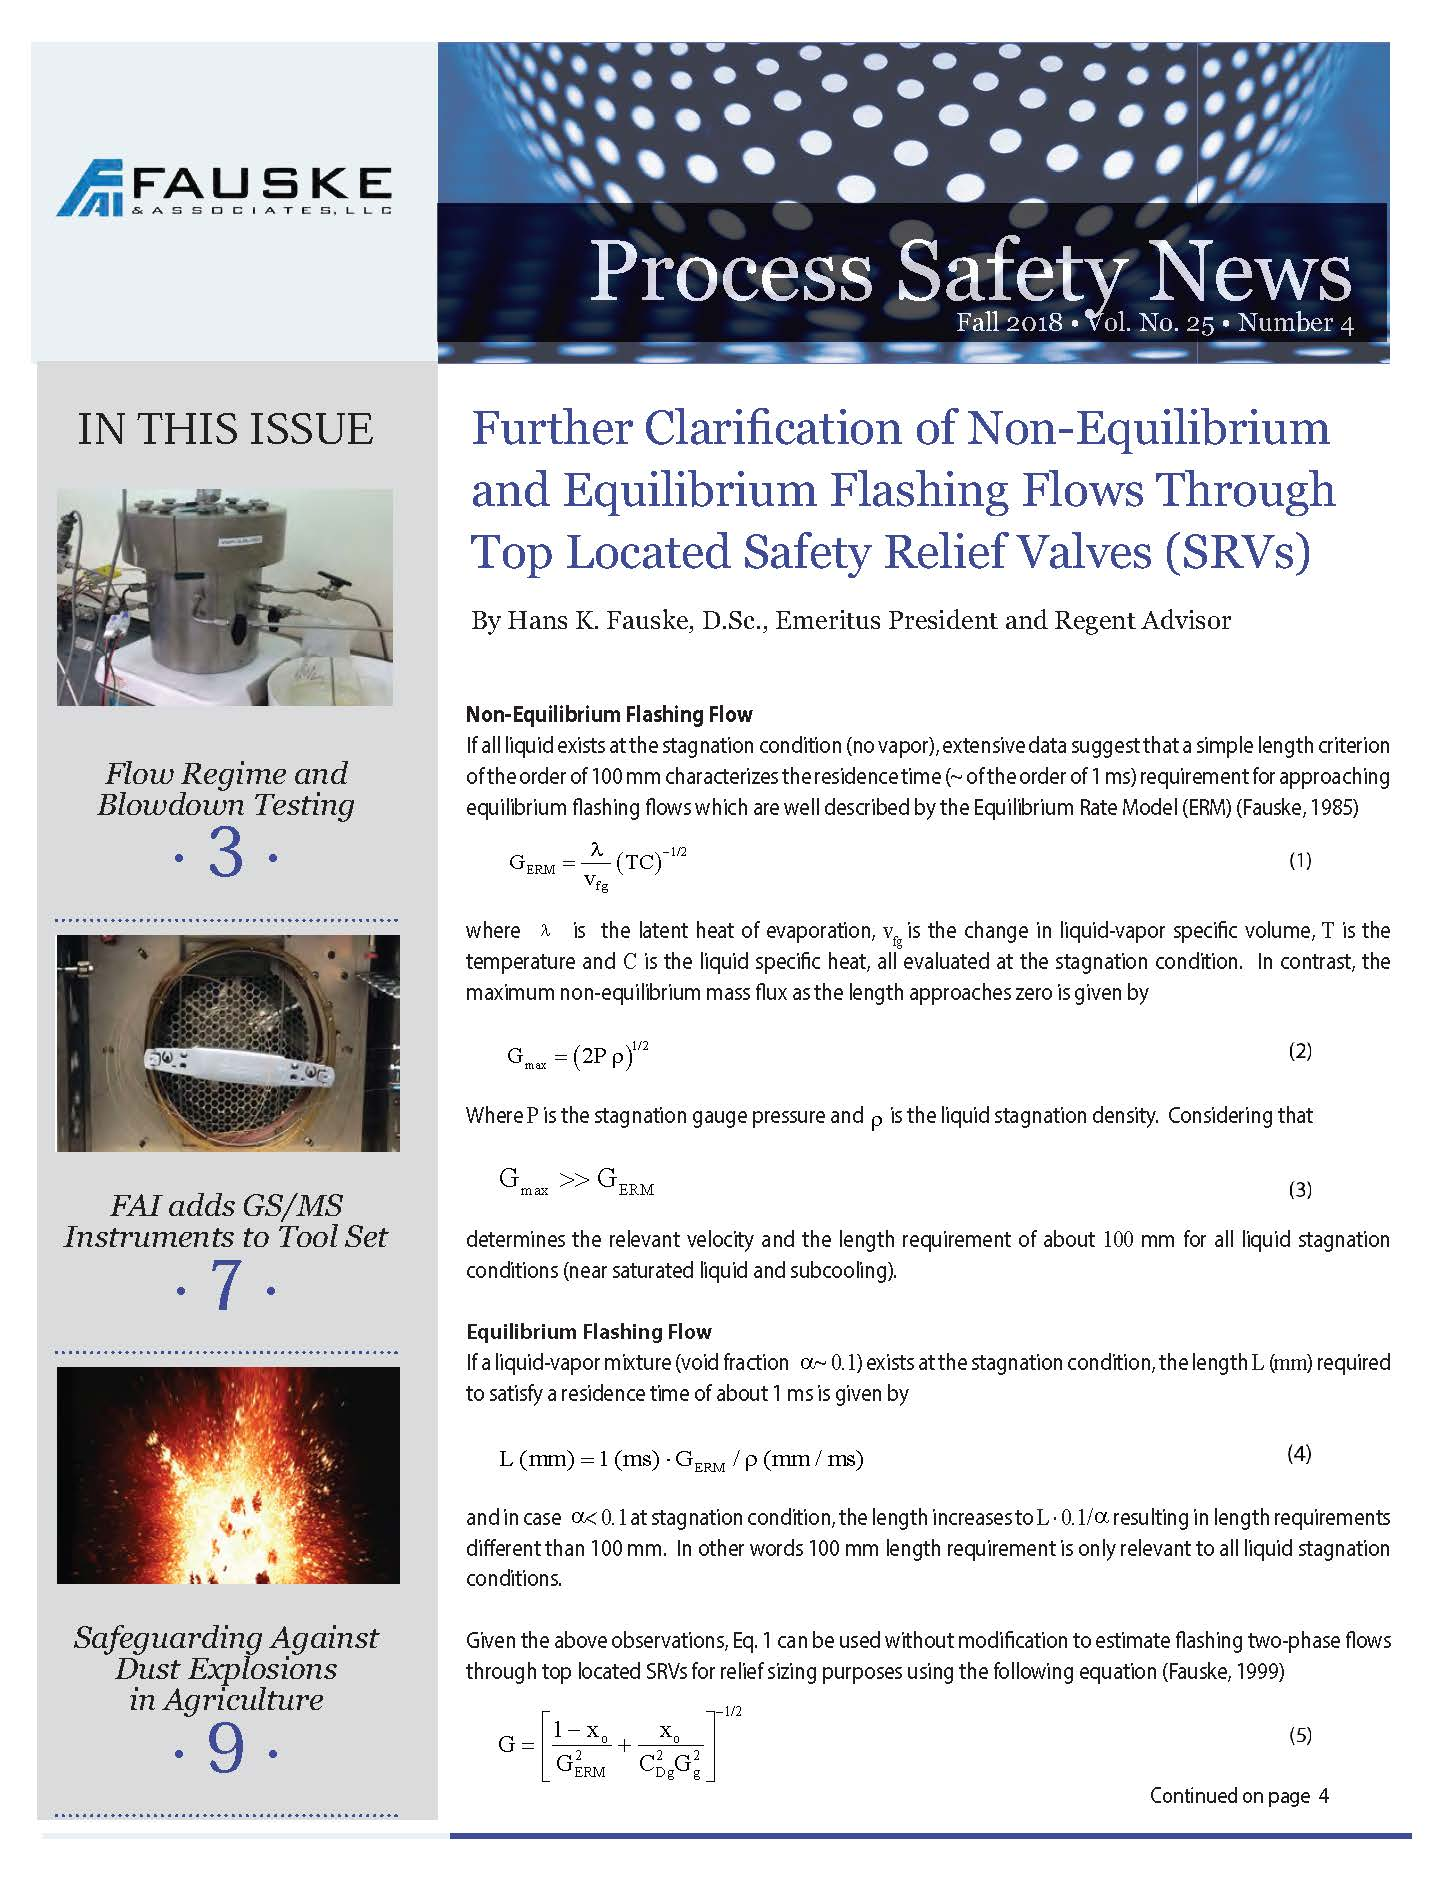 process safety risk based assessment news